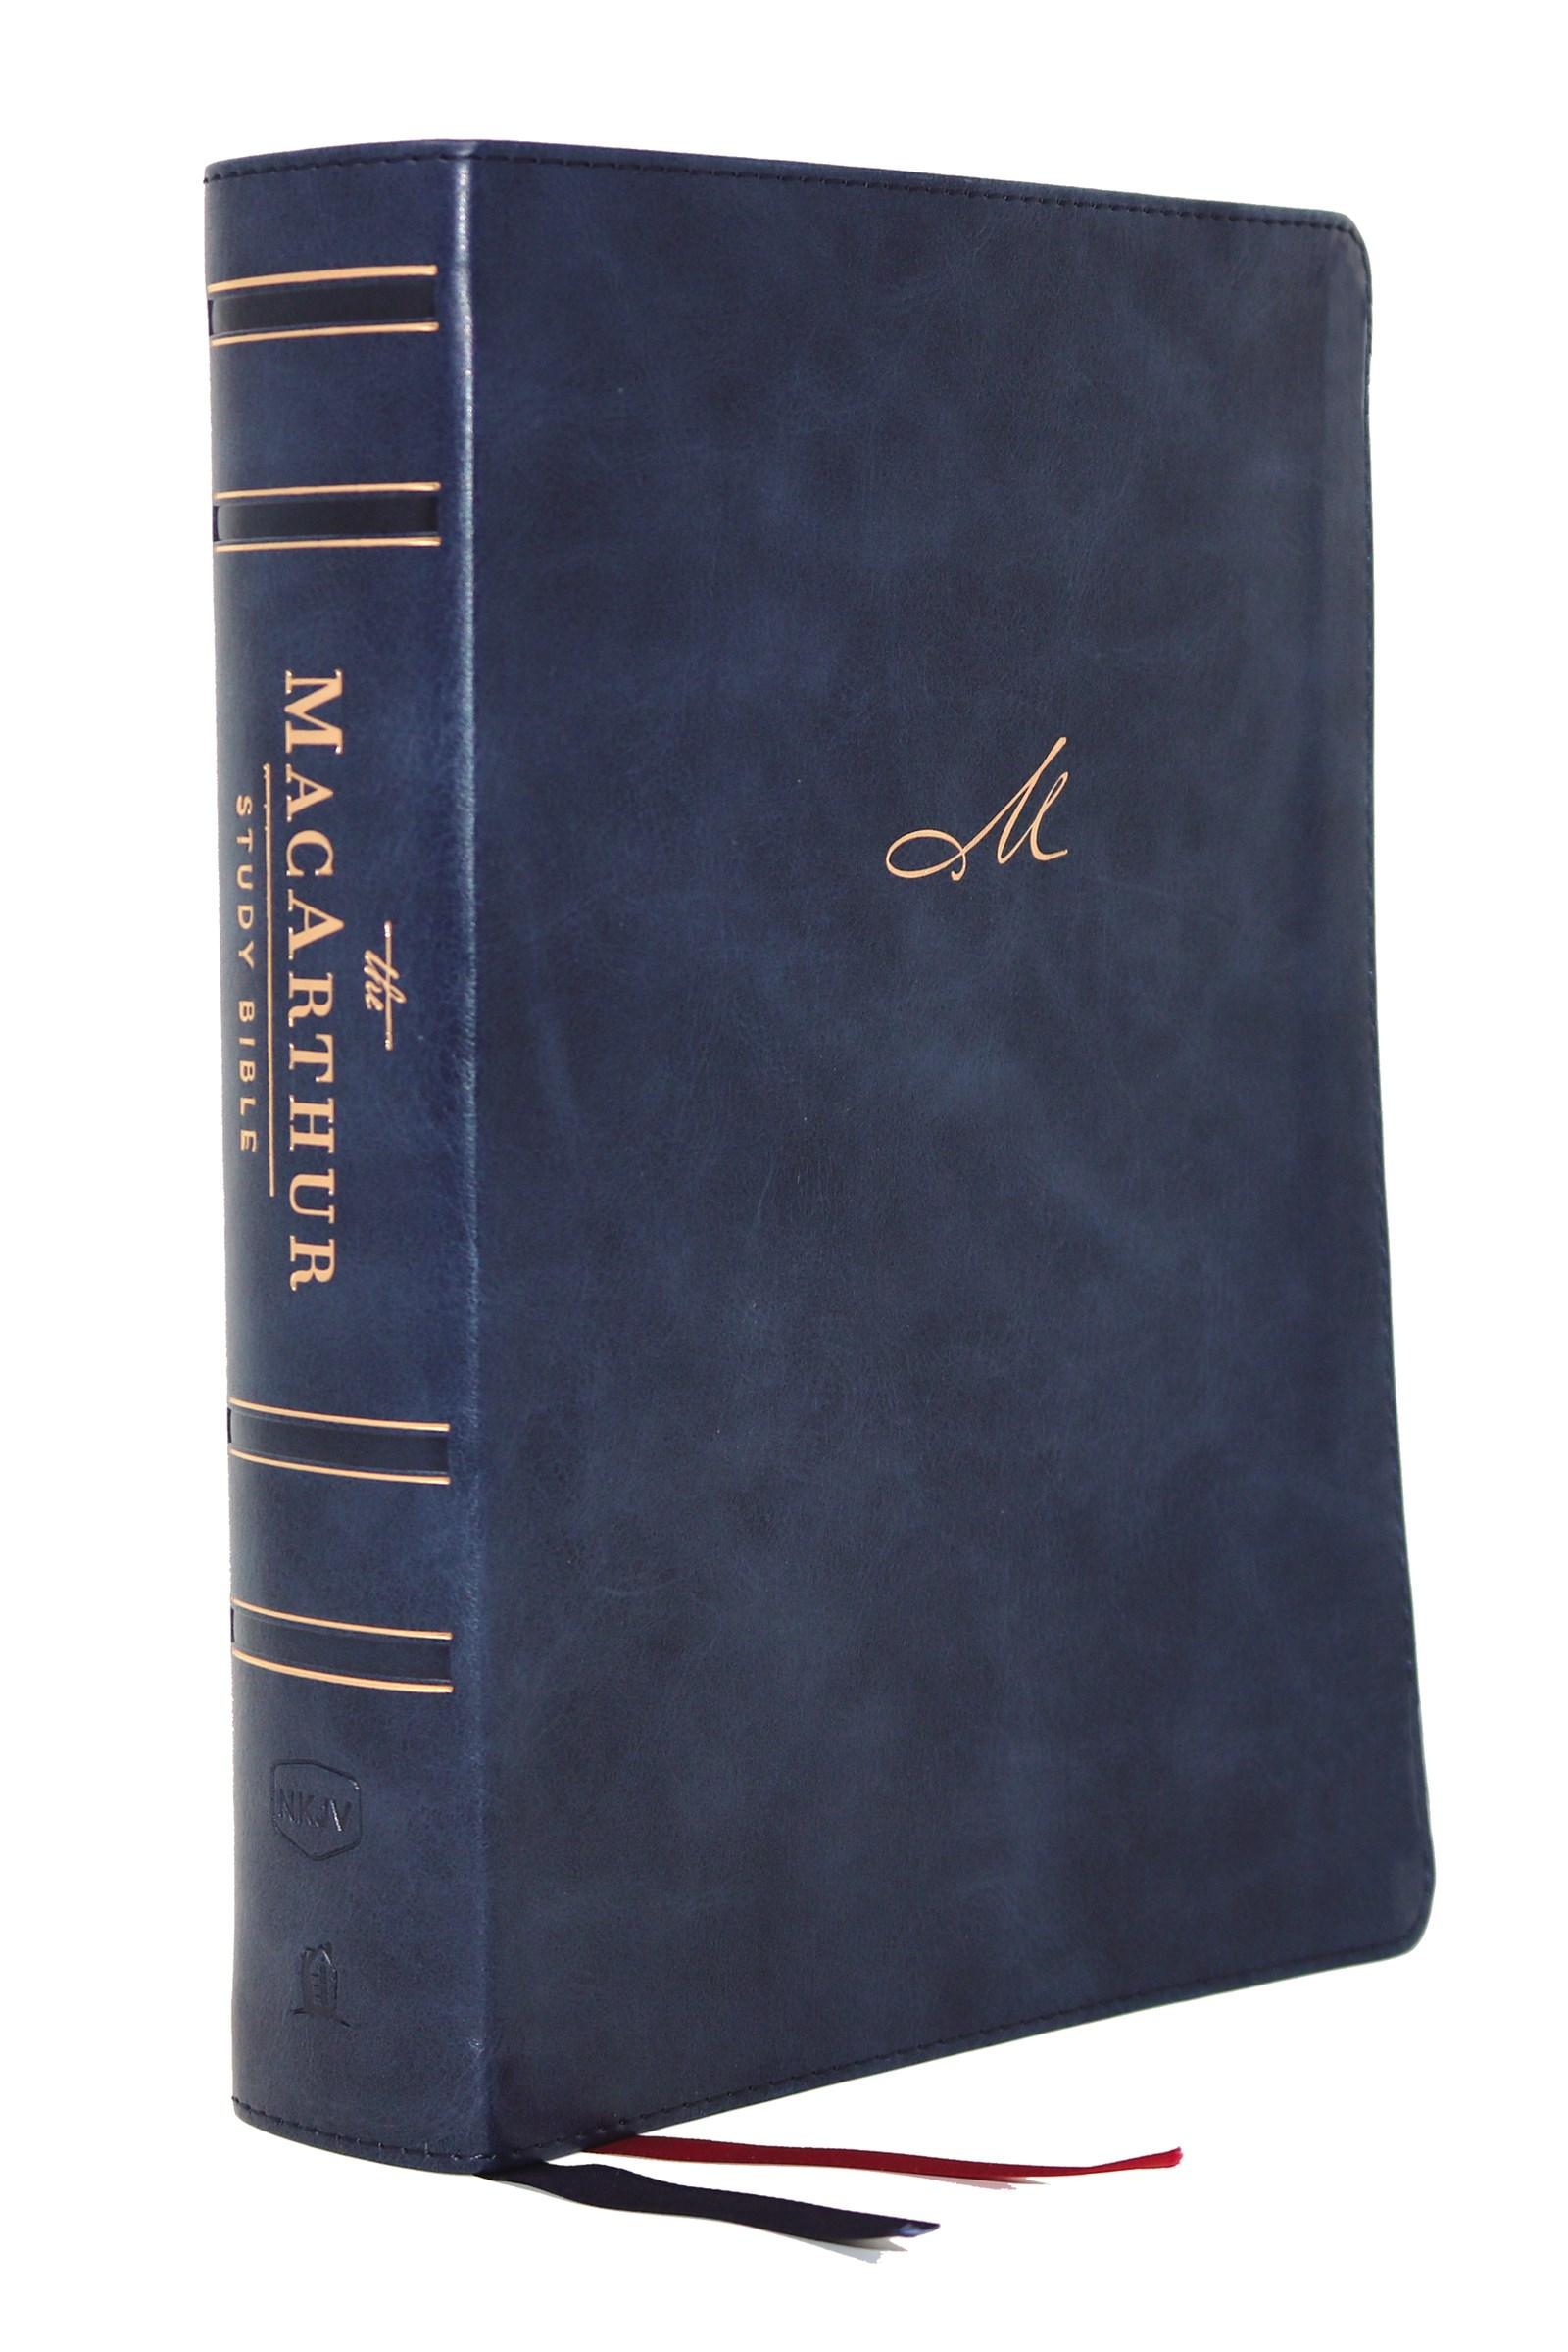 NKJV MacArthur Study Bible (2nd Edition) (Comfort Print)-Navy Blue Leathersoft